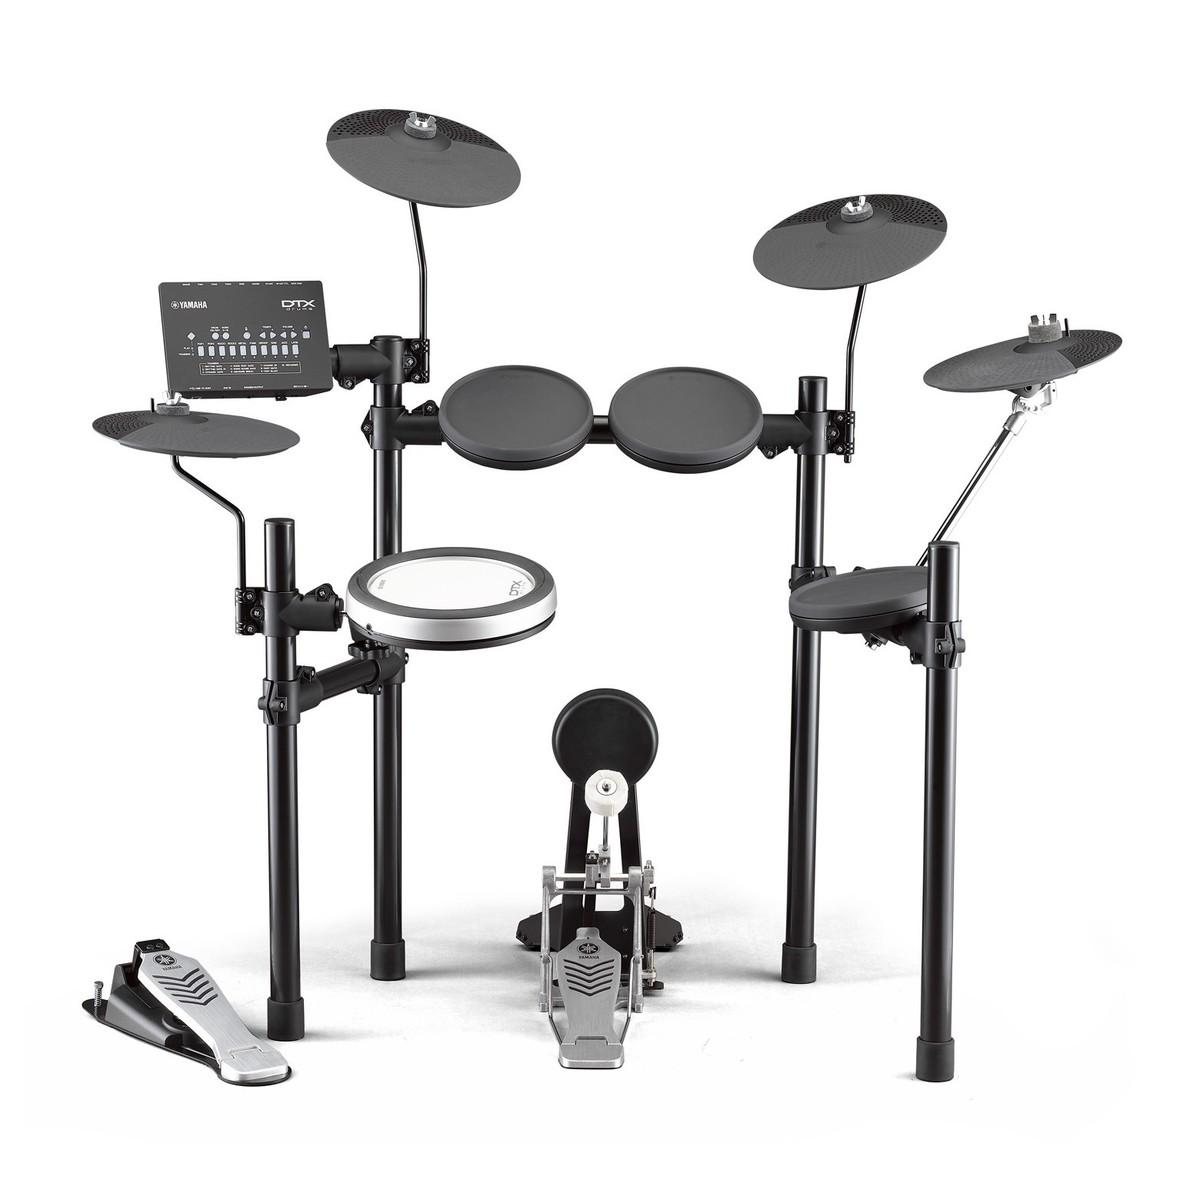 yamaha dtx482k electronic drum kit at gear4music. Black Bedroom Furniture Sets. Home Design Ideas